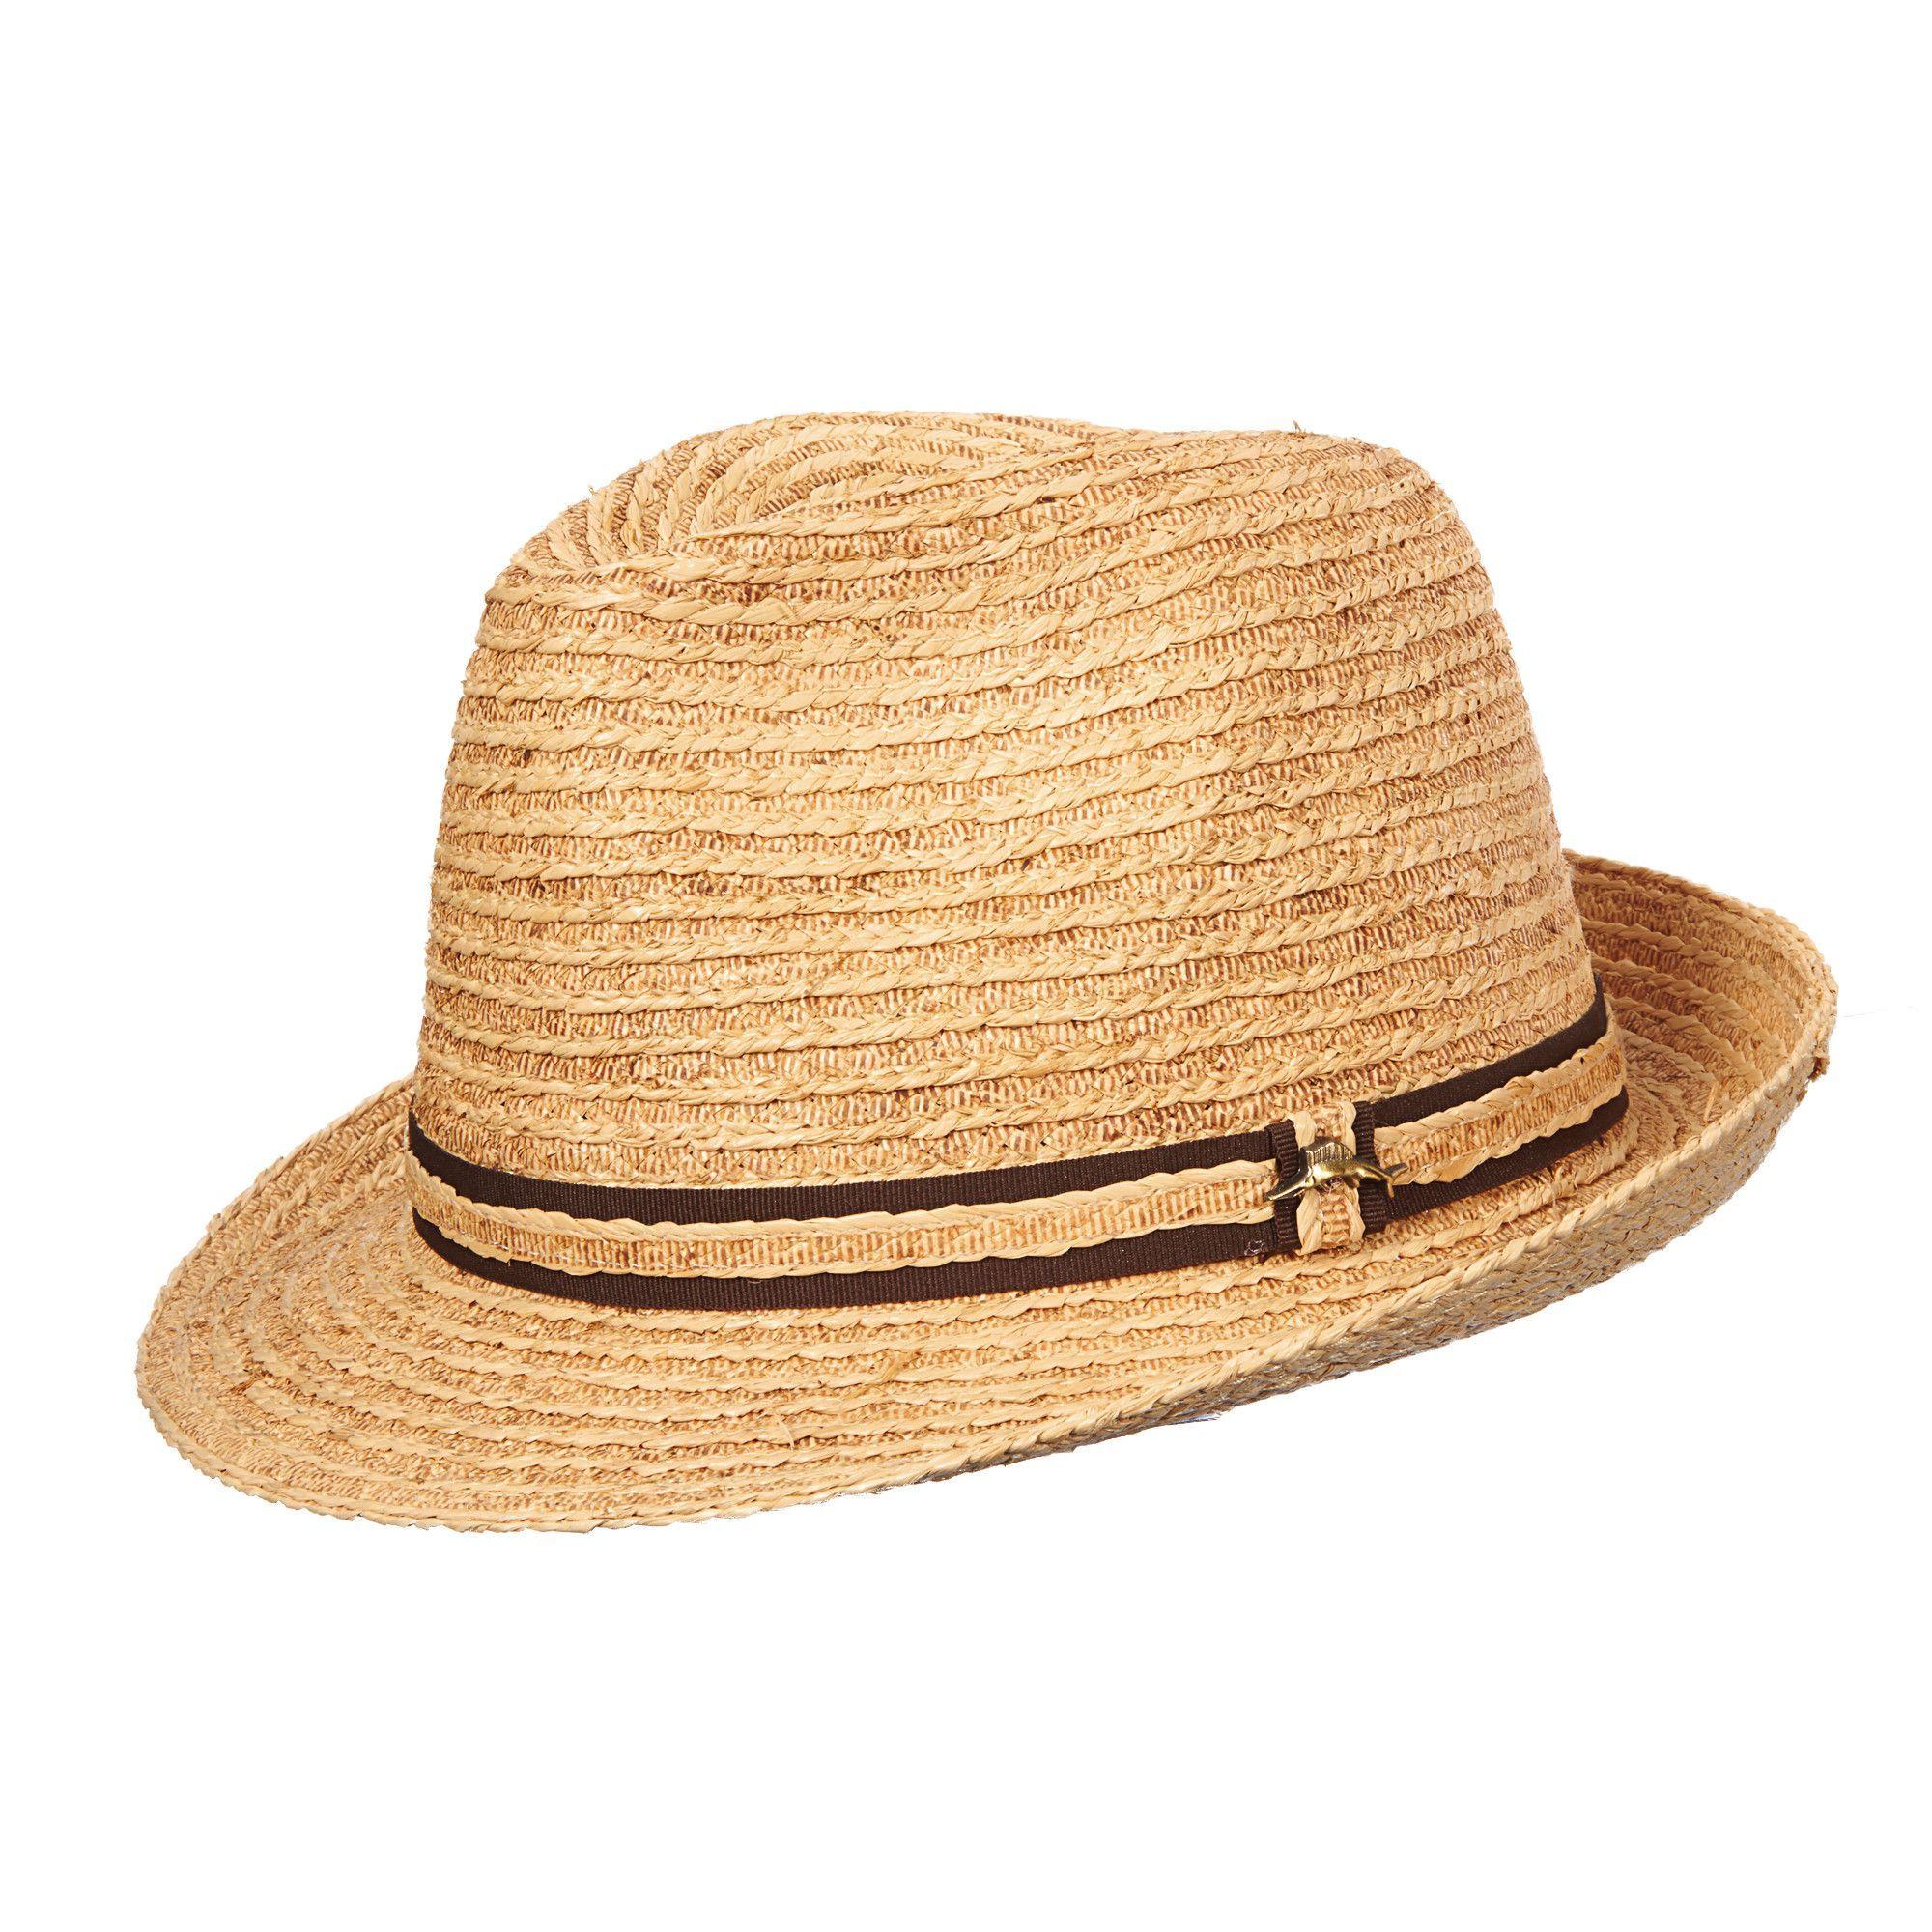 Tommy Bahama Raffia Straw Fedora Hat  e17bfc4d5bd1